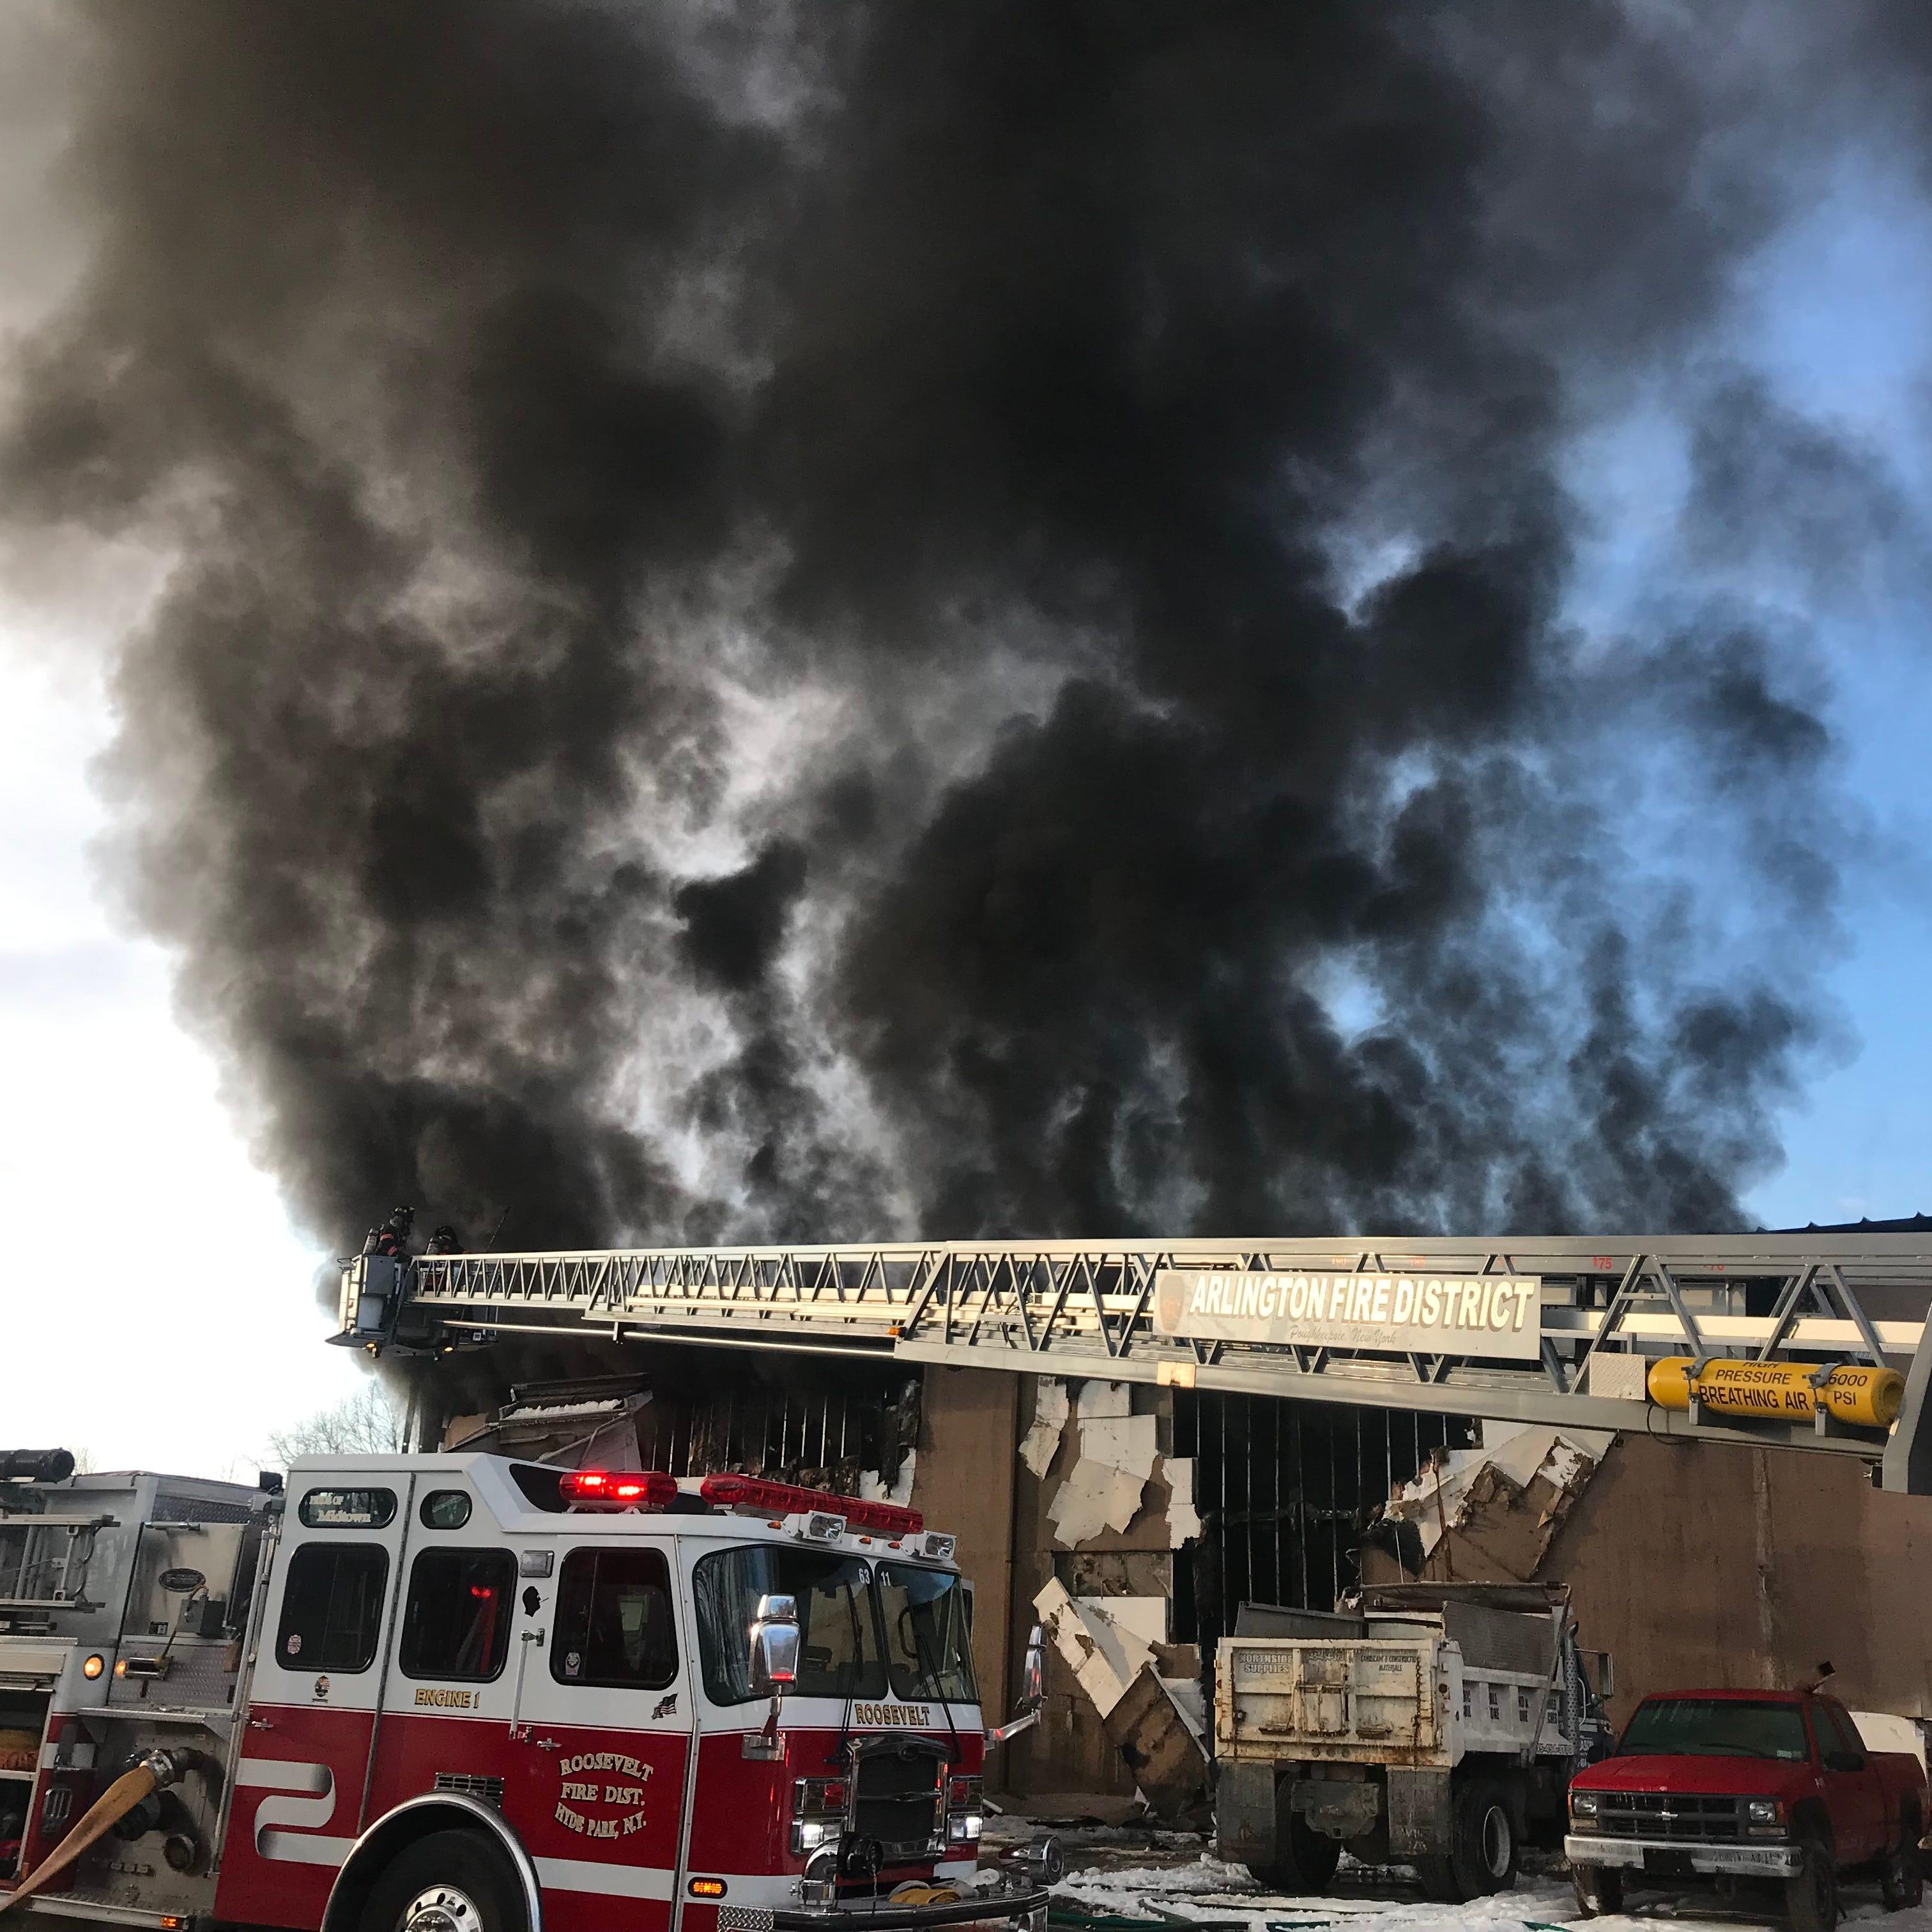 Poughkeepsie blaze: Thomas Gleason company, renters look to rebuild after devastating fire